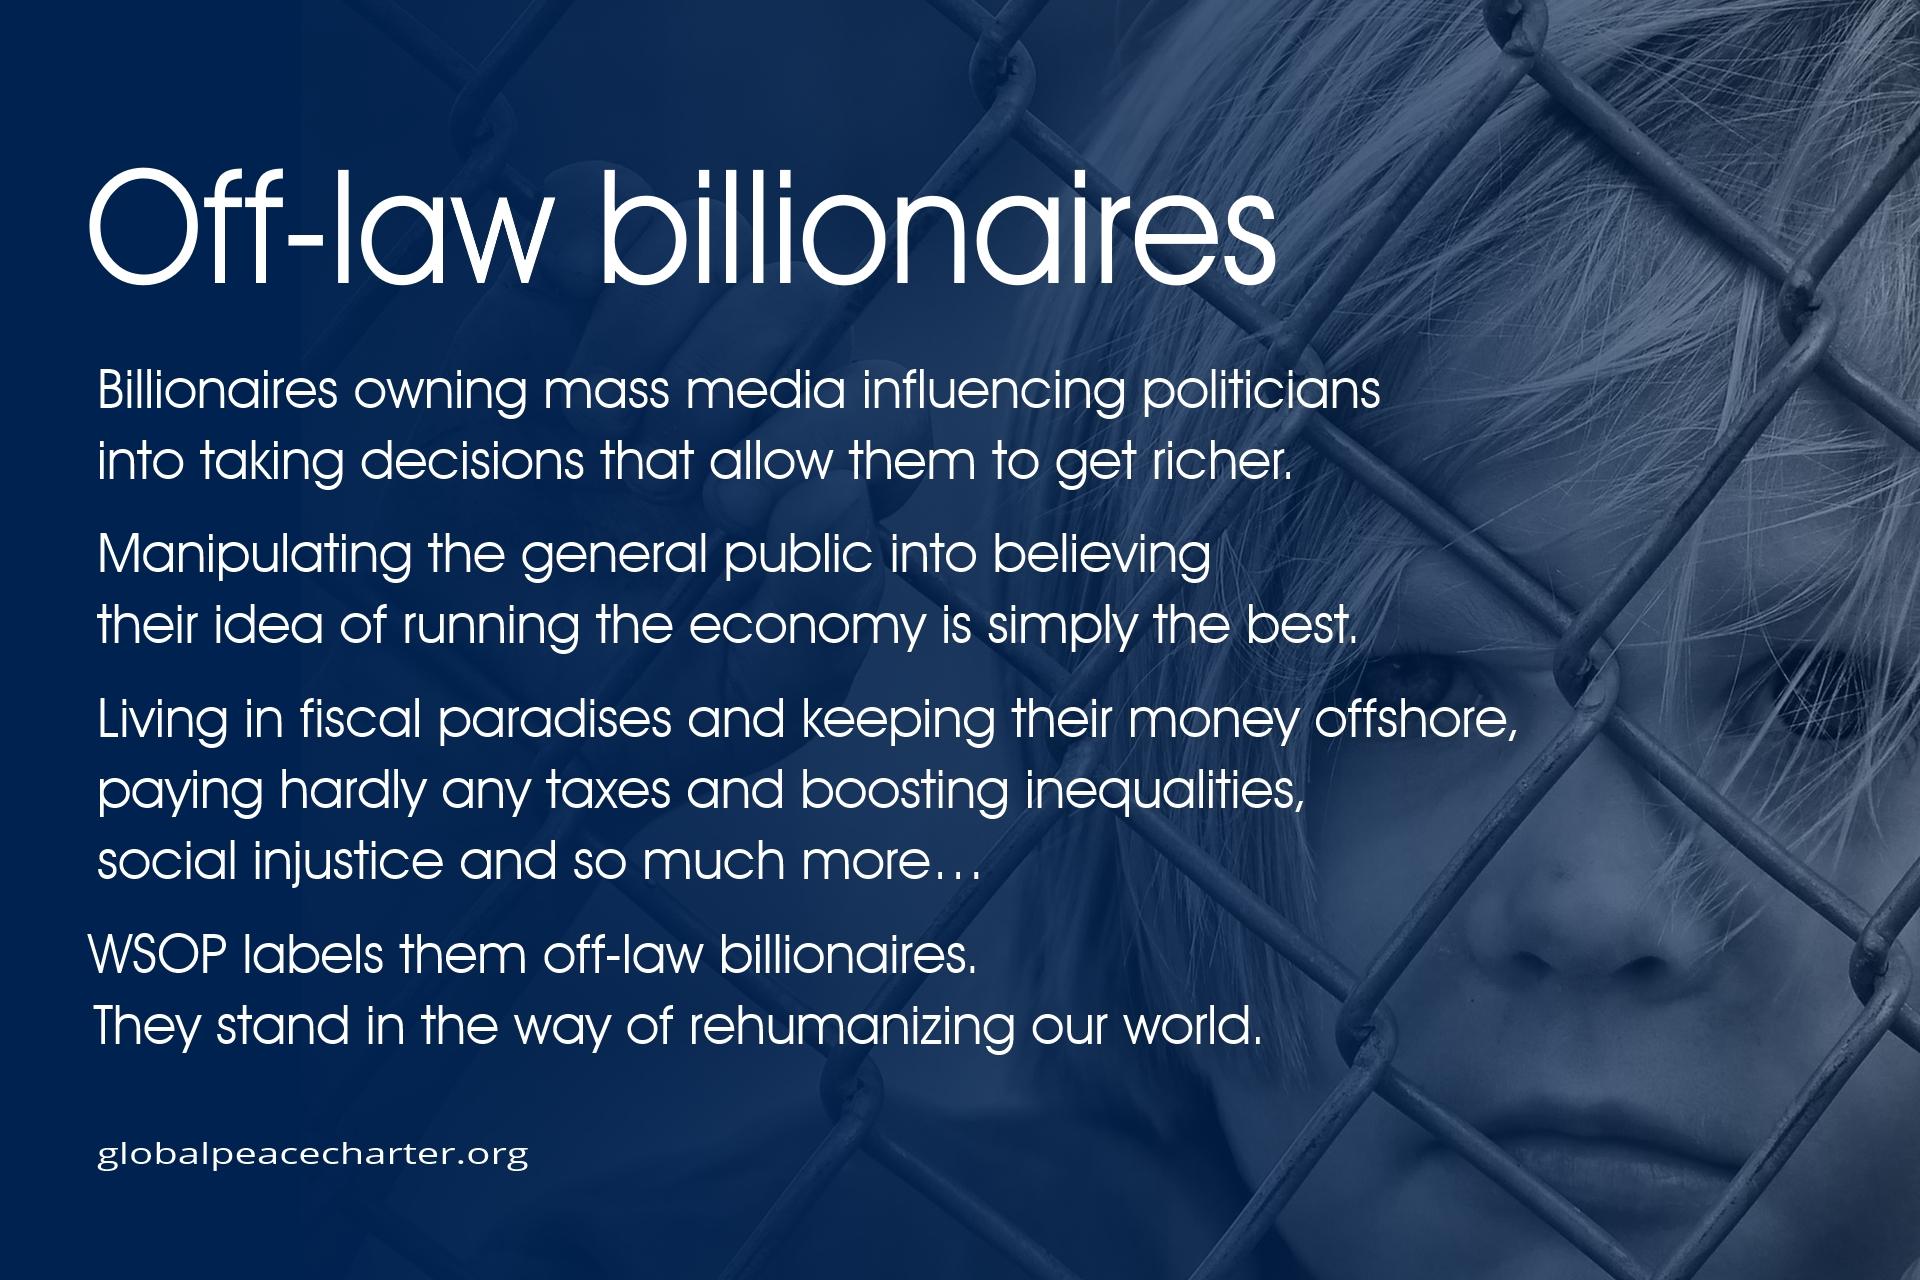 Off-law billionaires